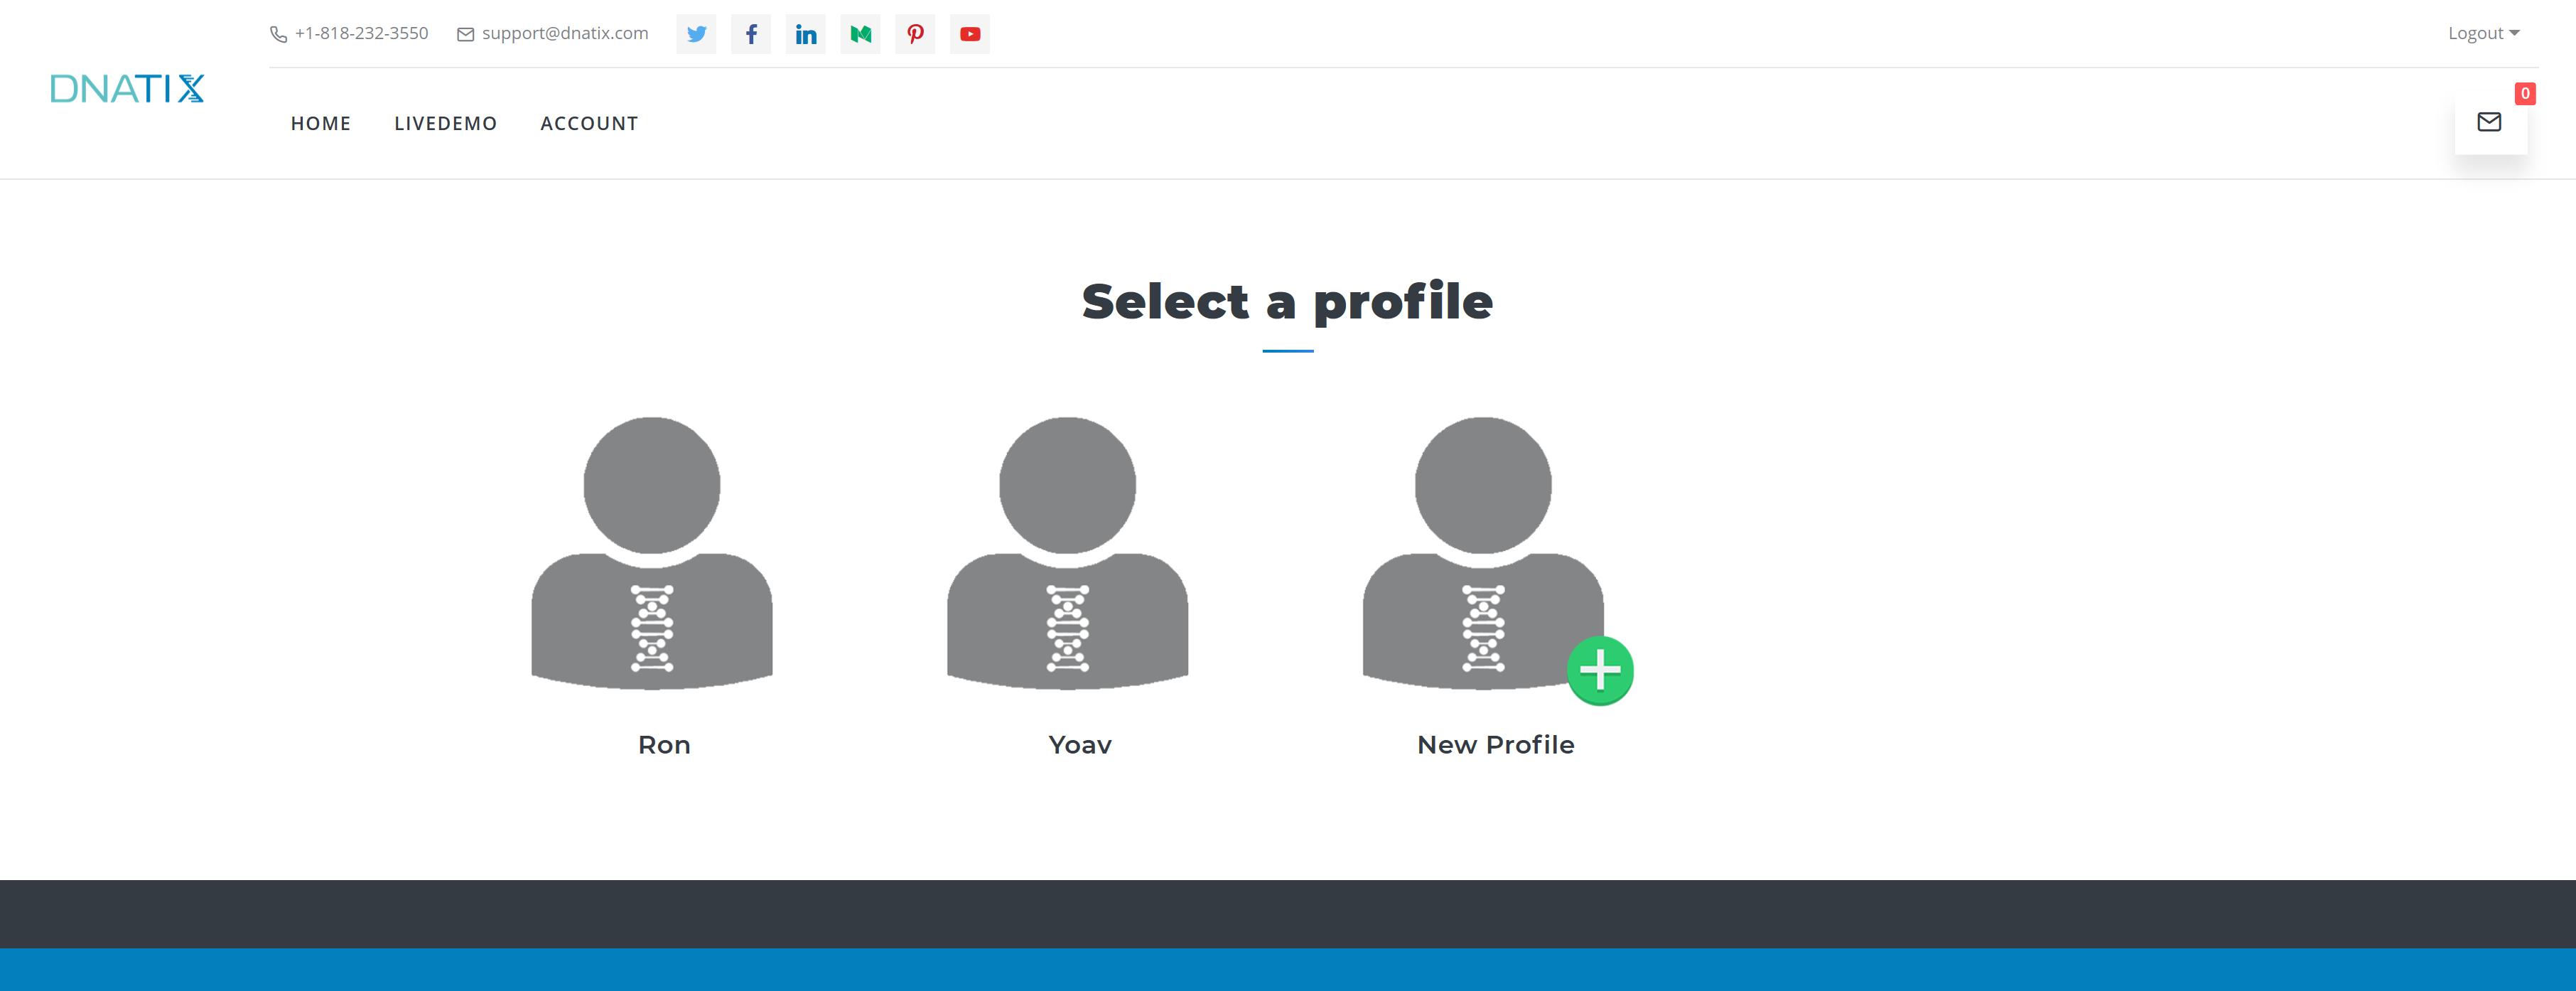 DNAtix - Profile